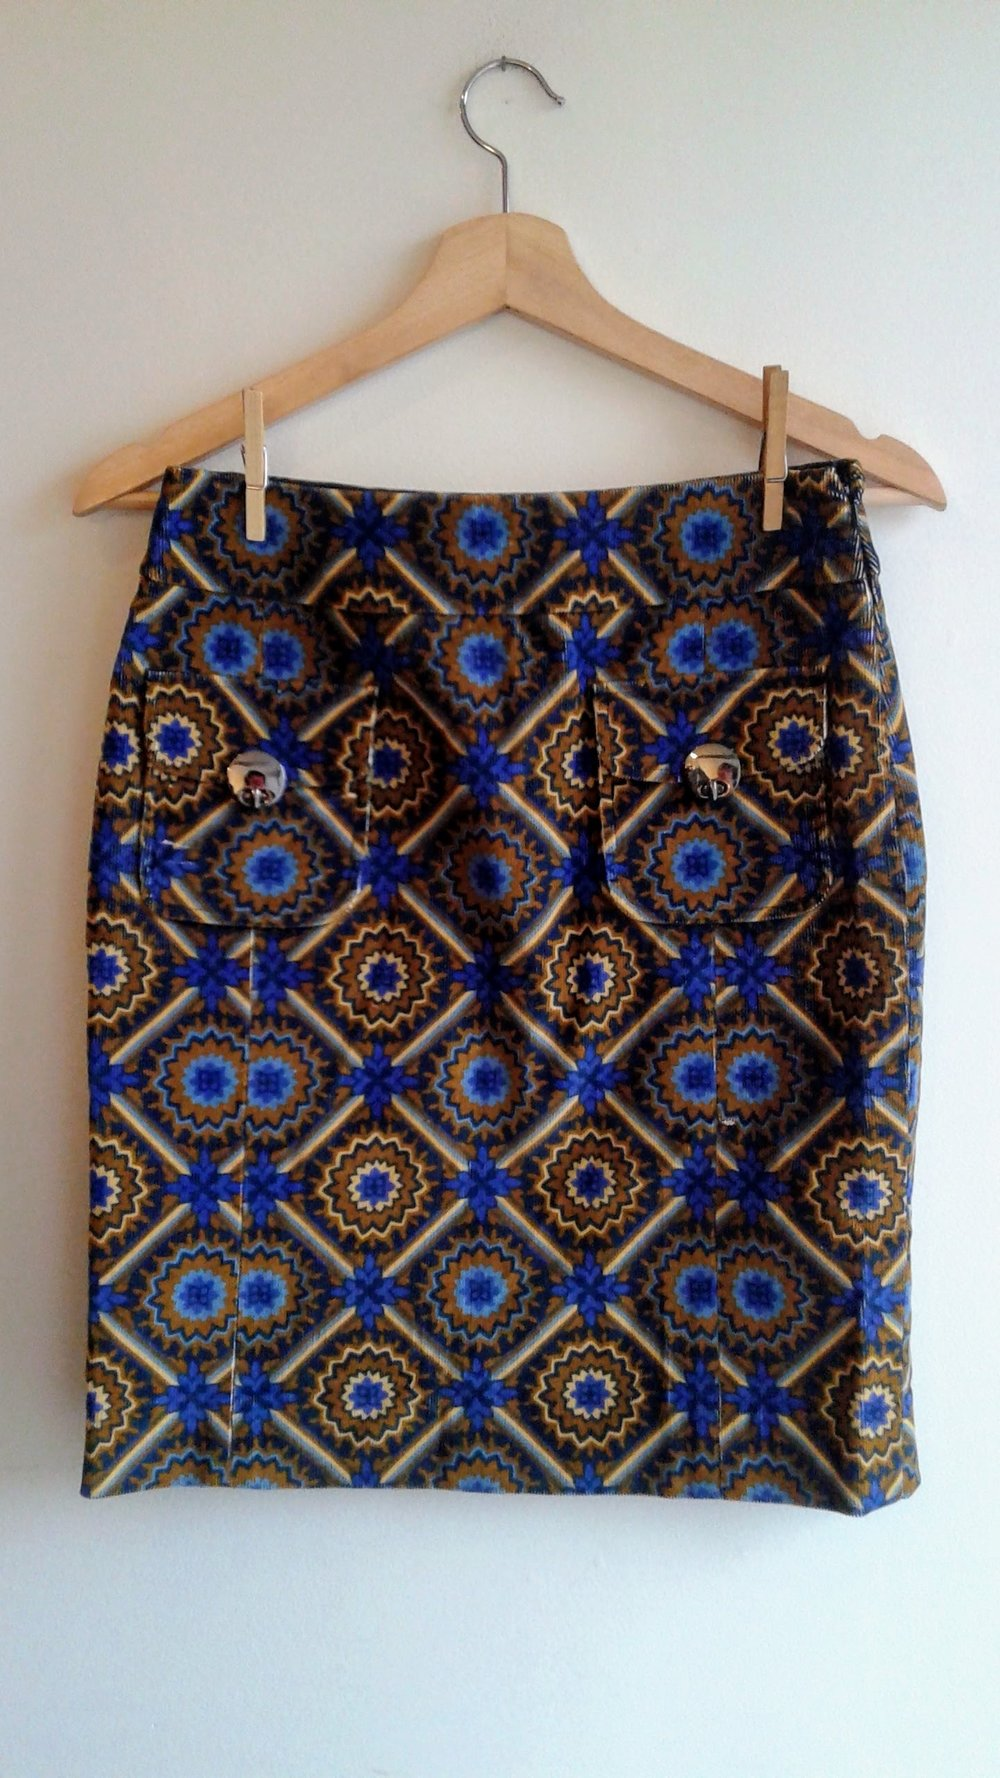 Etcetera  skirt; Size S, $18